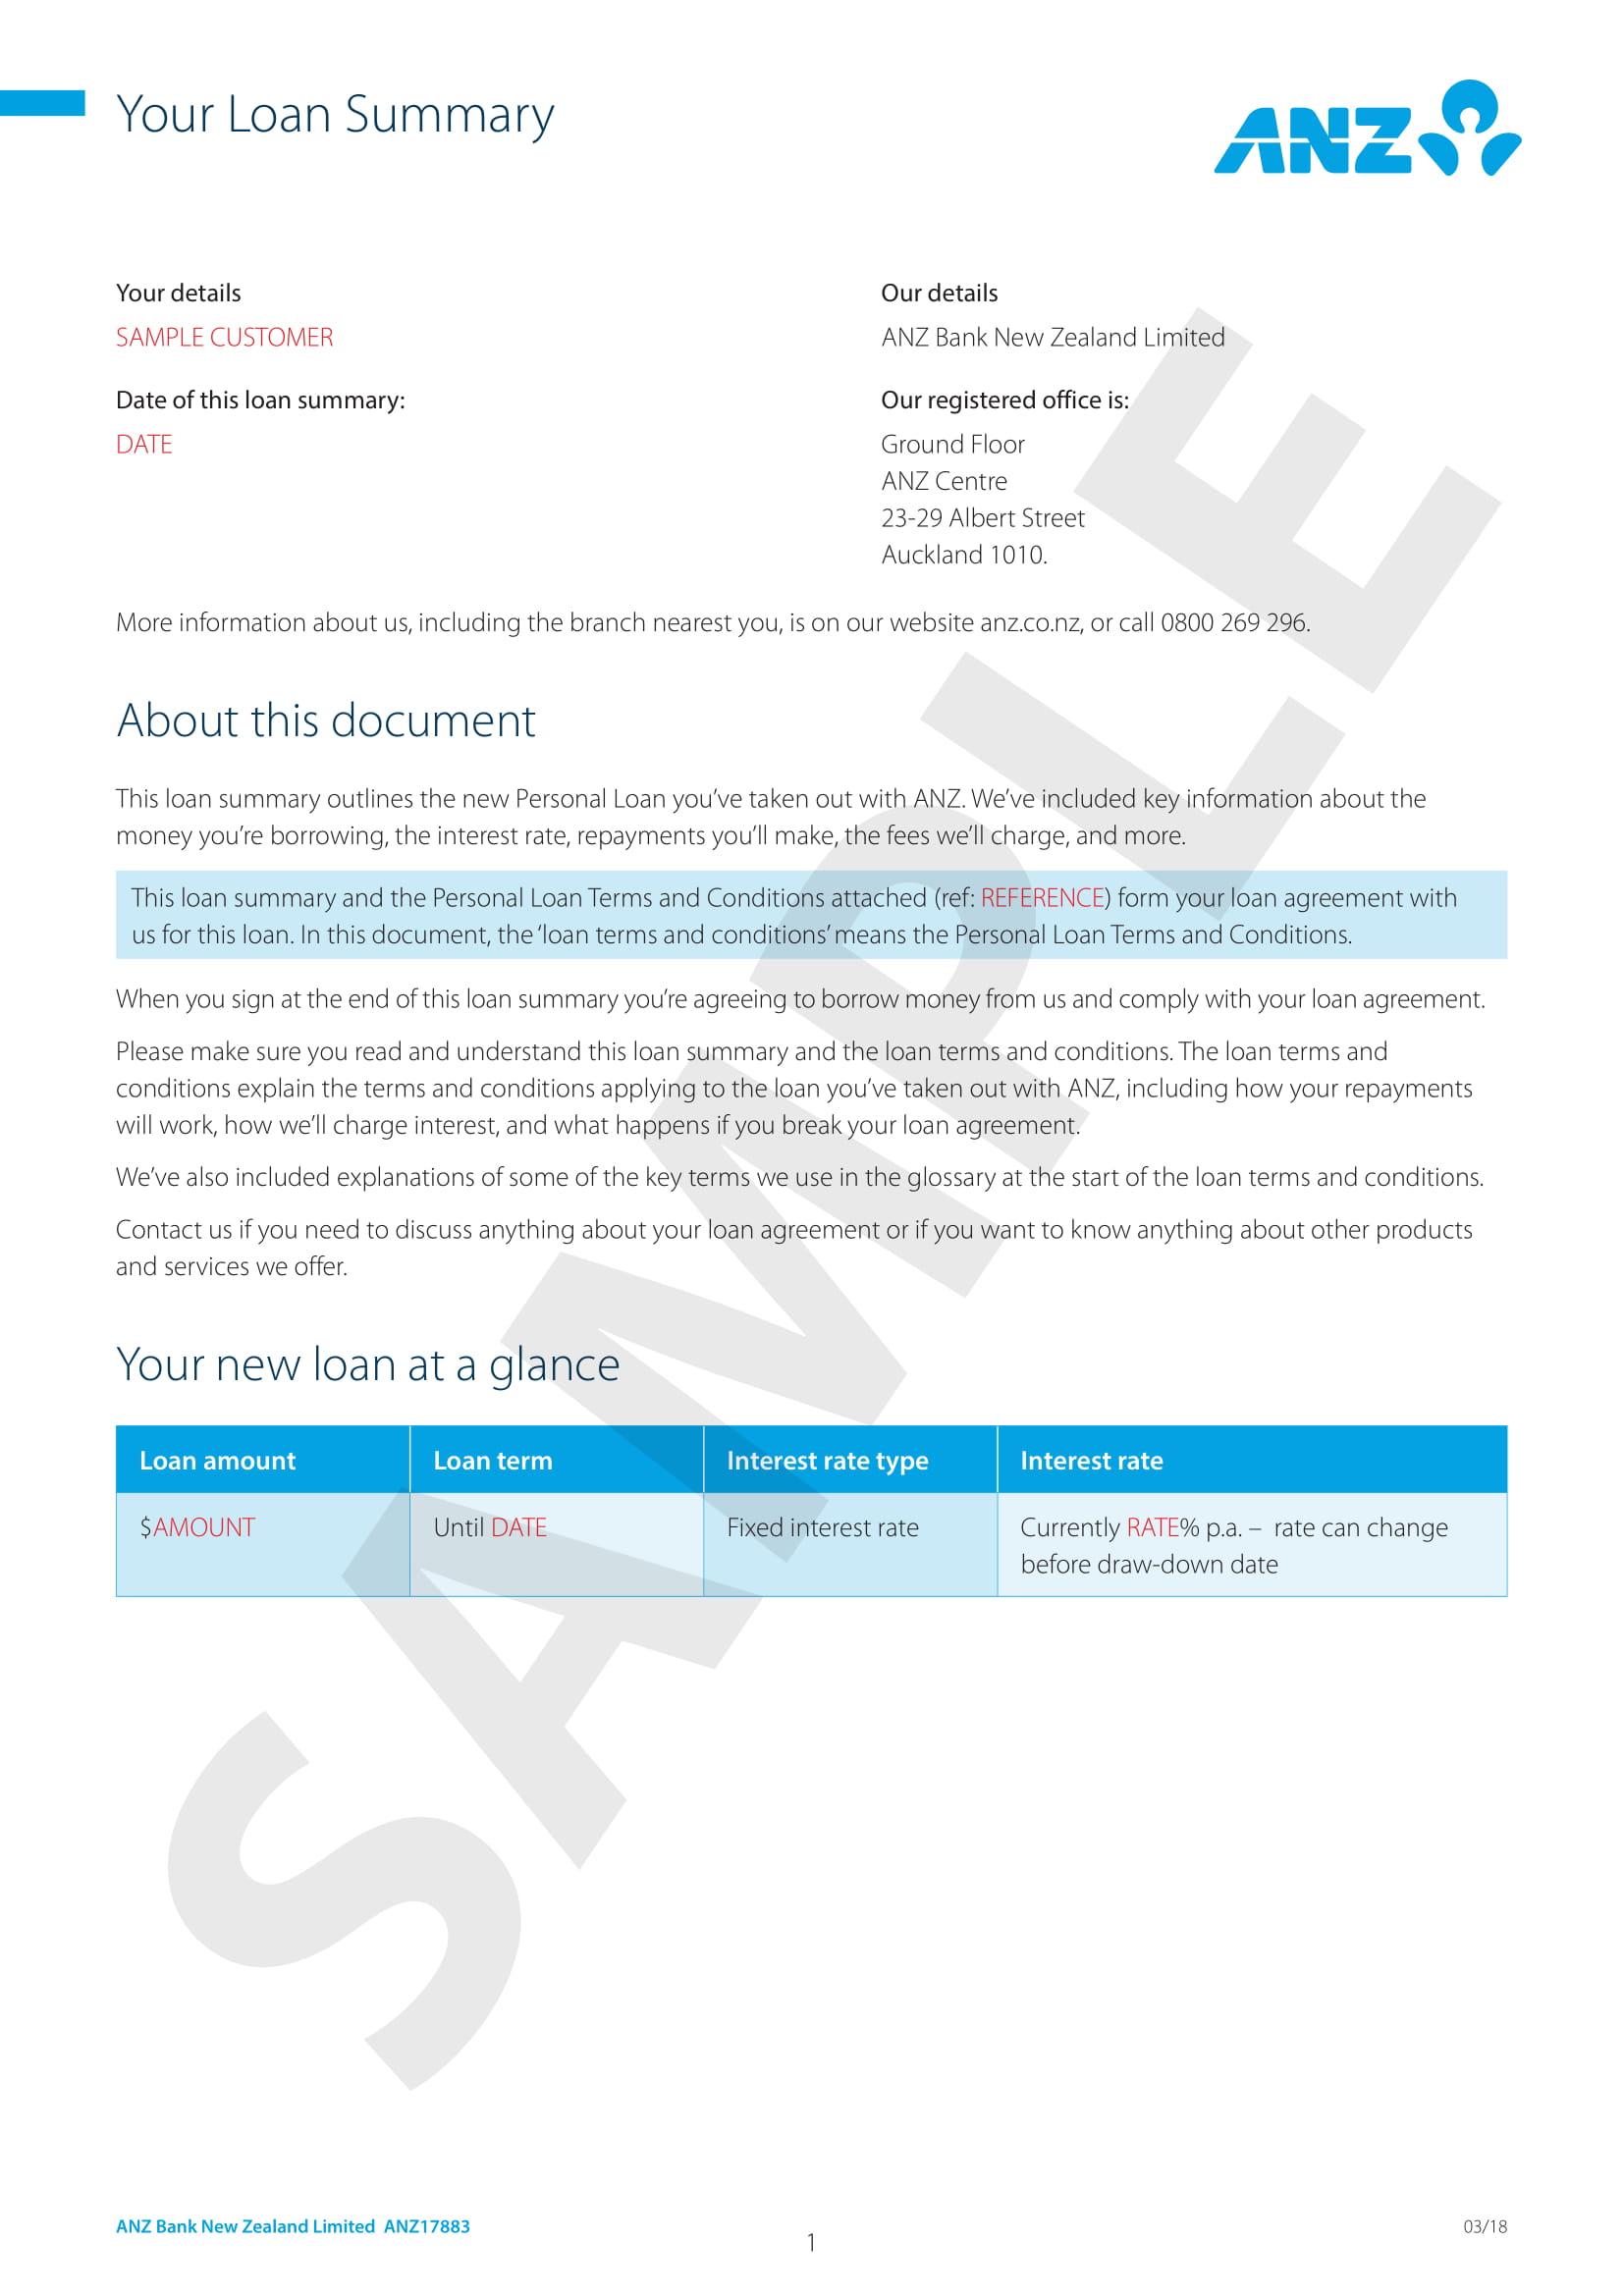 loan summary